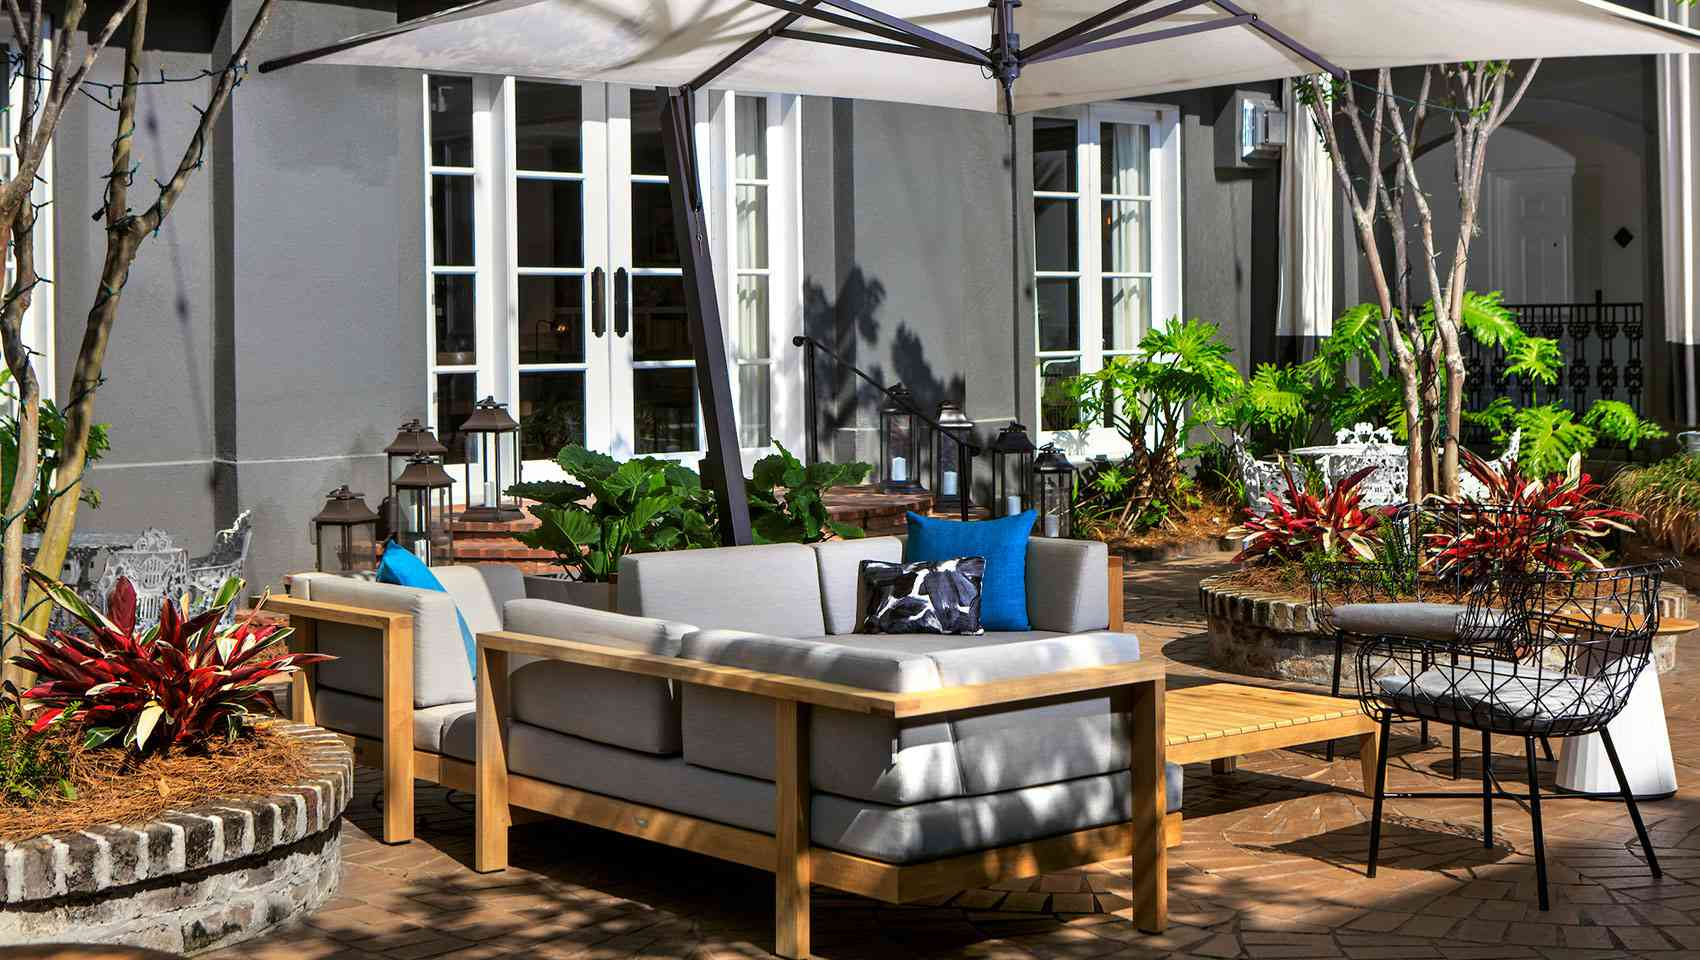 Garden patio at the Kimpton Brice hotel